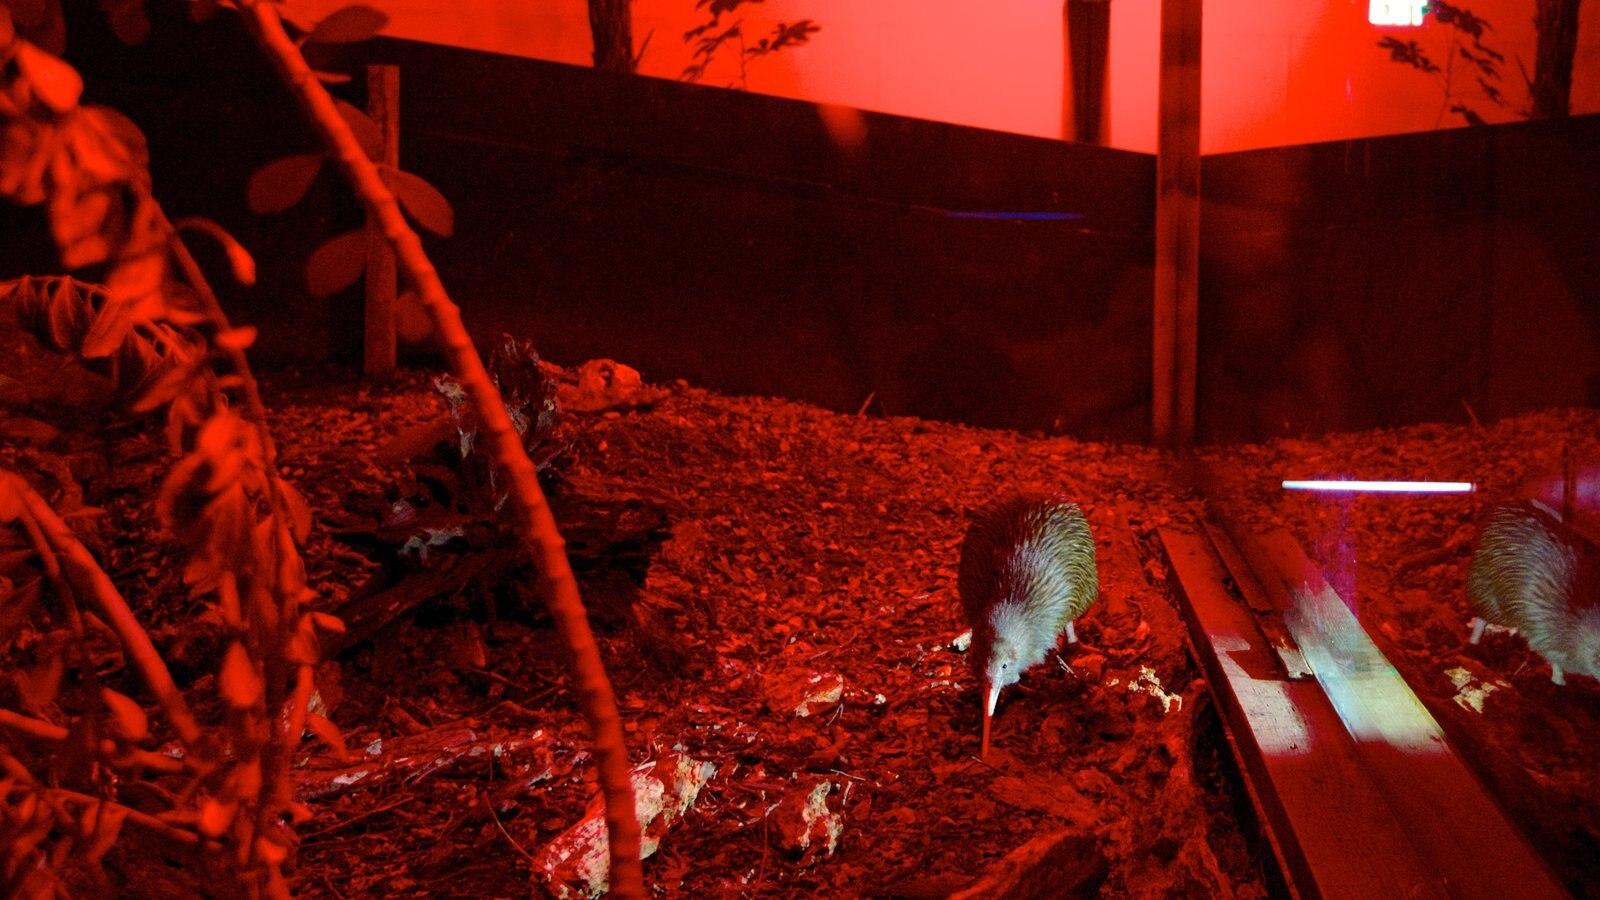 Kiwi and Birdlife Park showing zoo animals, bird life and interior views